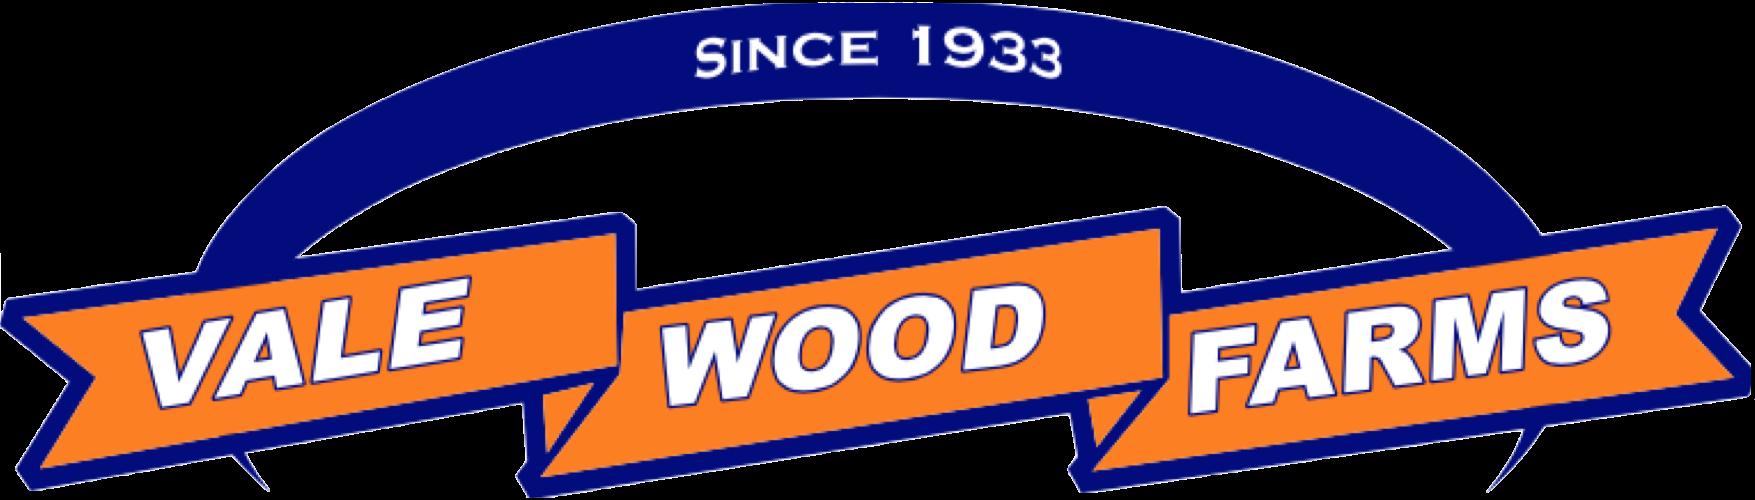 About us vale wood. Farming clipart plot land